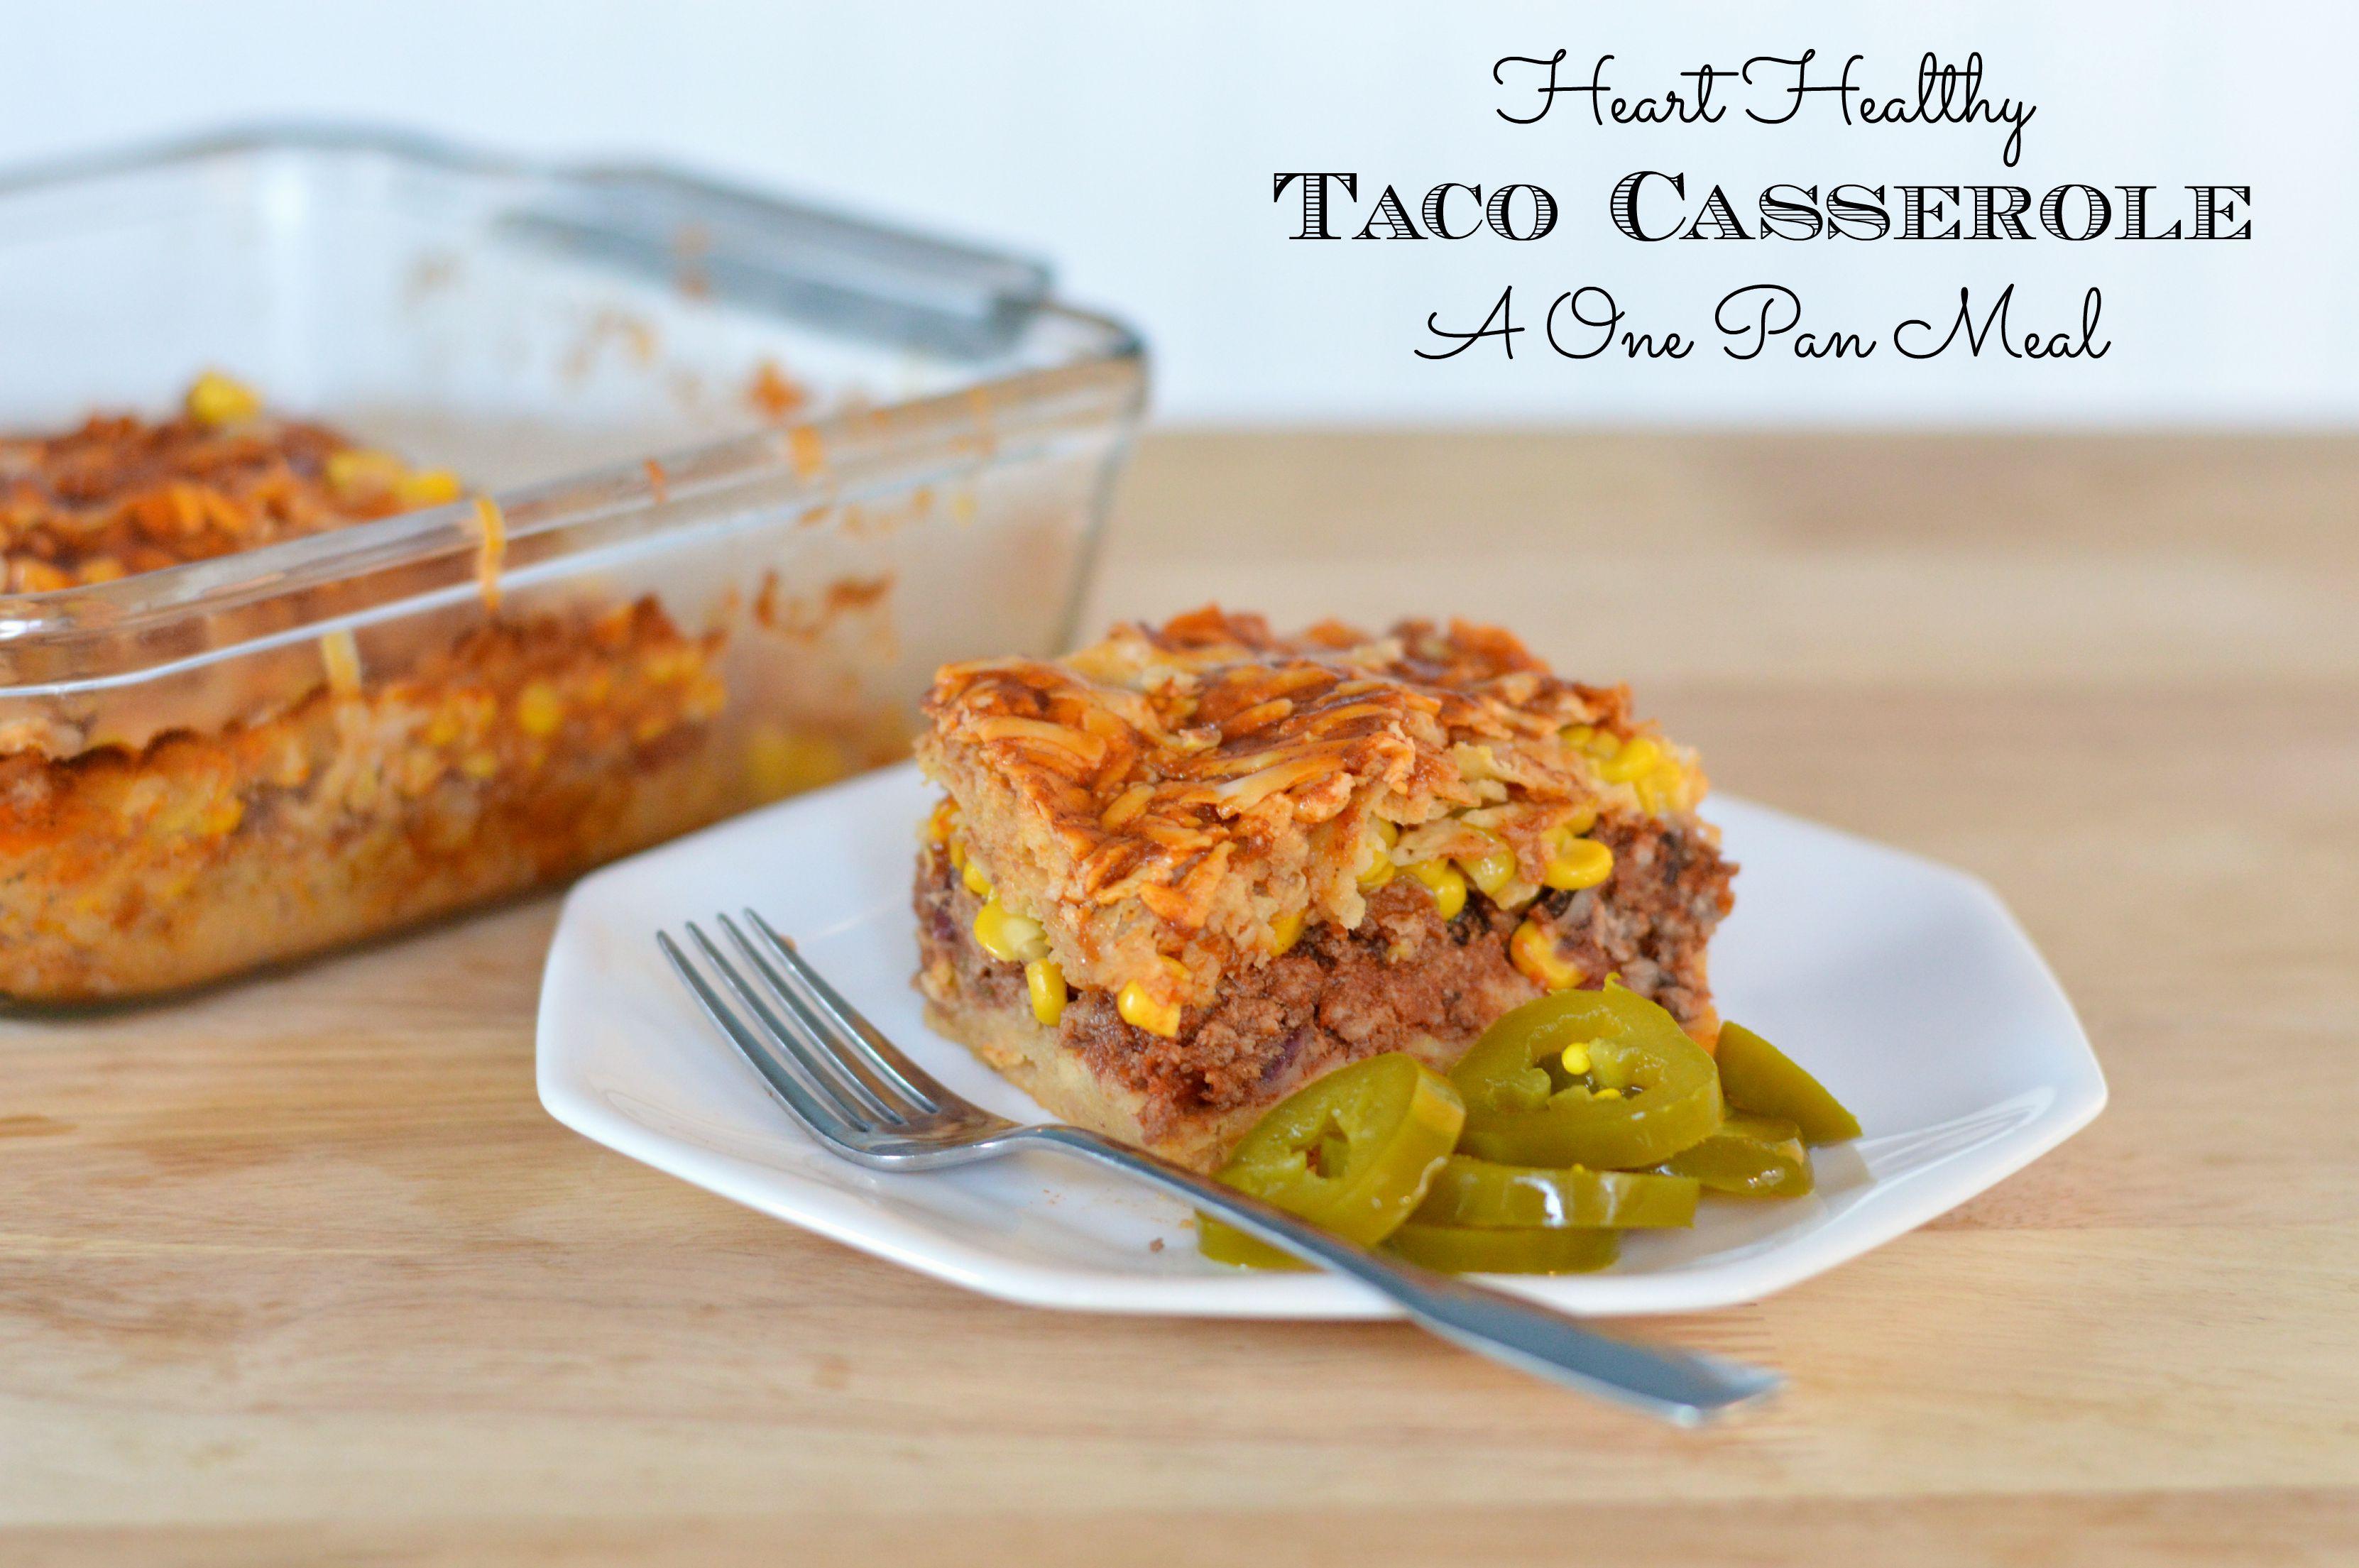 Heart Healthy Casseroles  e Pan Heart Healthy Taco Casserole